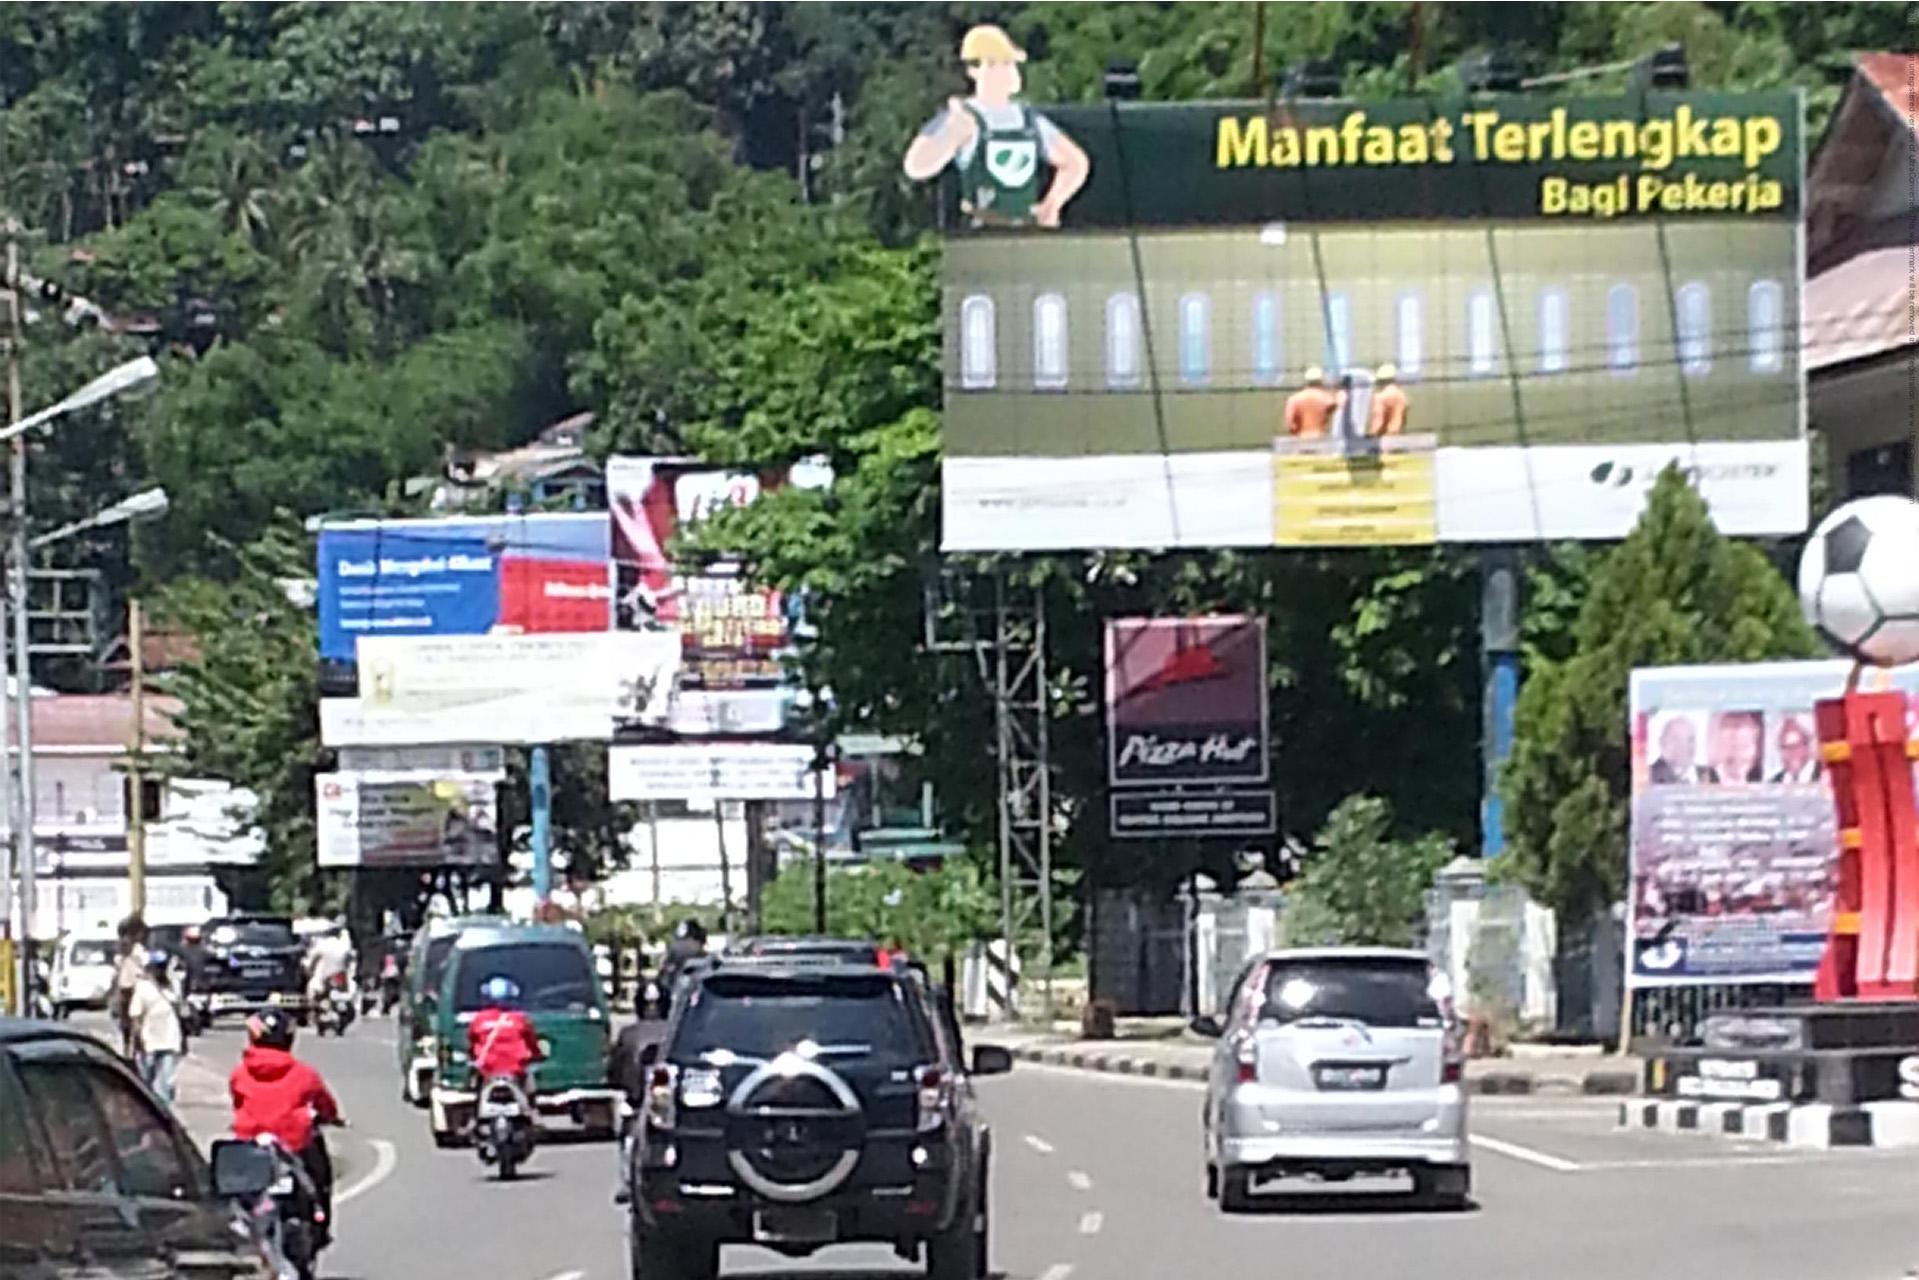 Jamsostek Jl. Samratulangi Irian Jaya